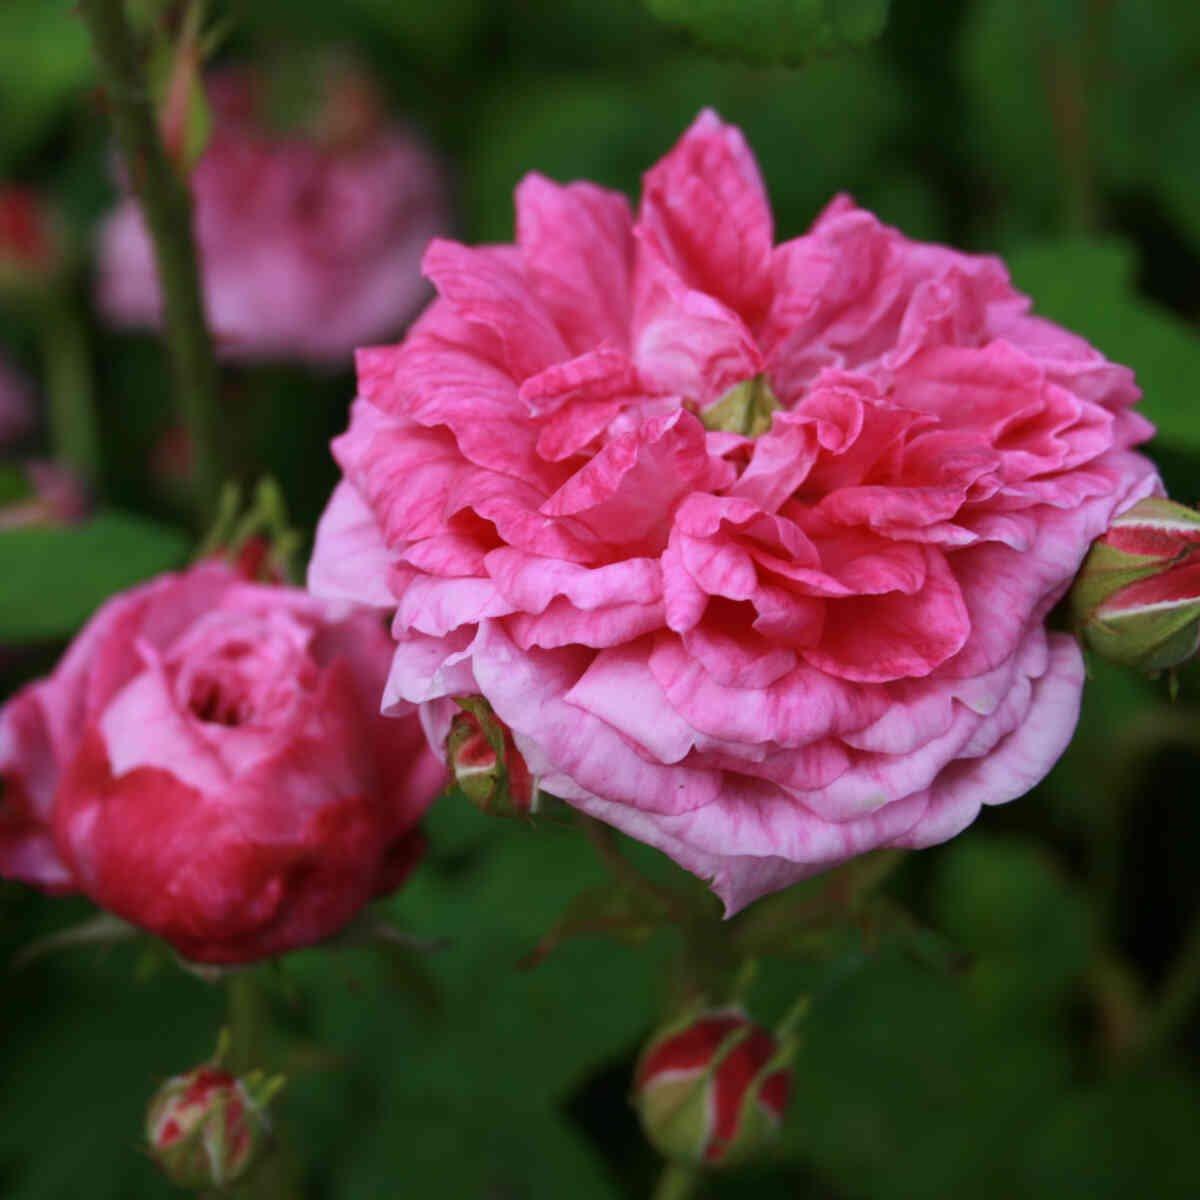 Centifolia rose 'Petite de Hollande'